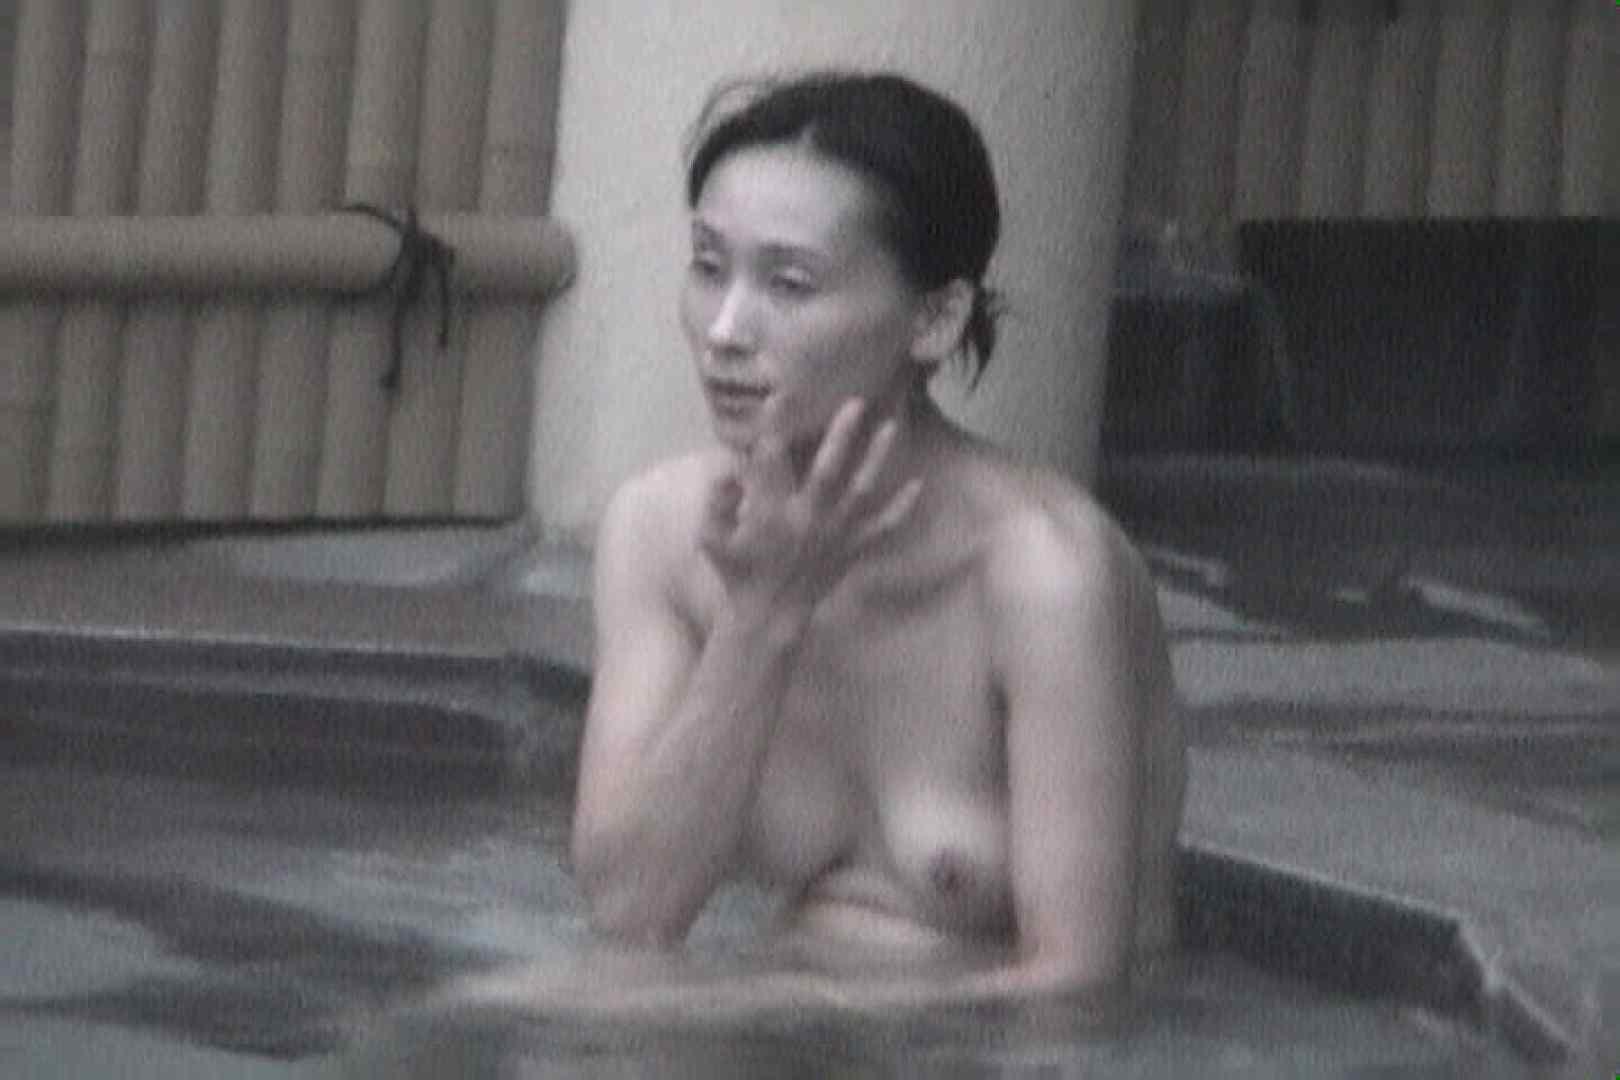 Aquaな露天風呂Vol.557 盗撮 盗み撮り動画キャプチャ 34連発 32